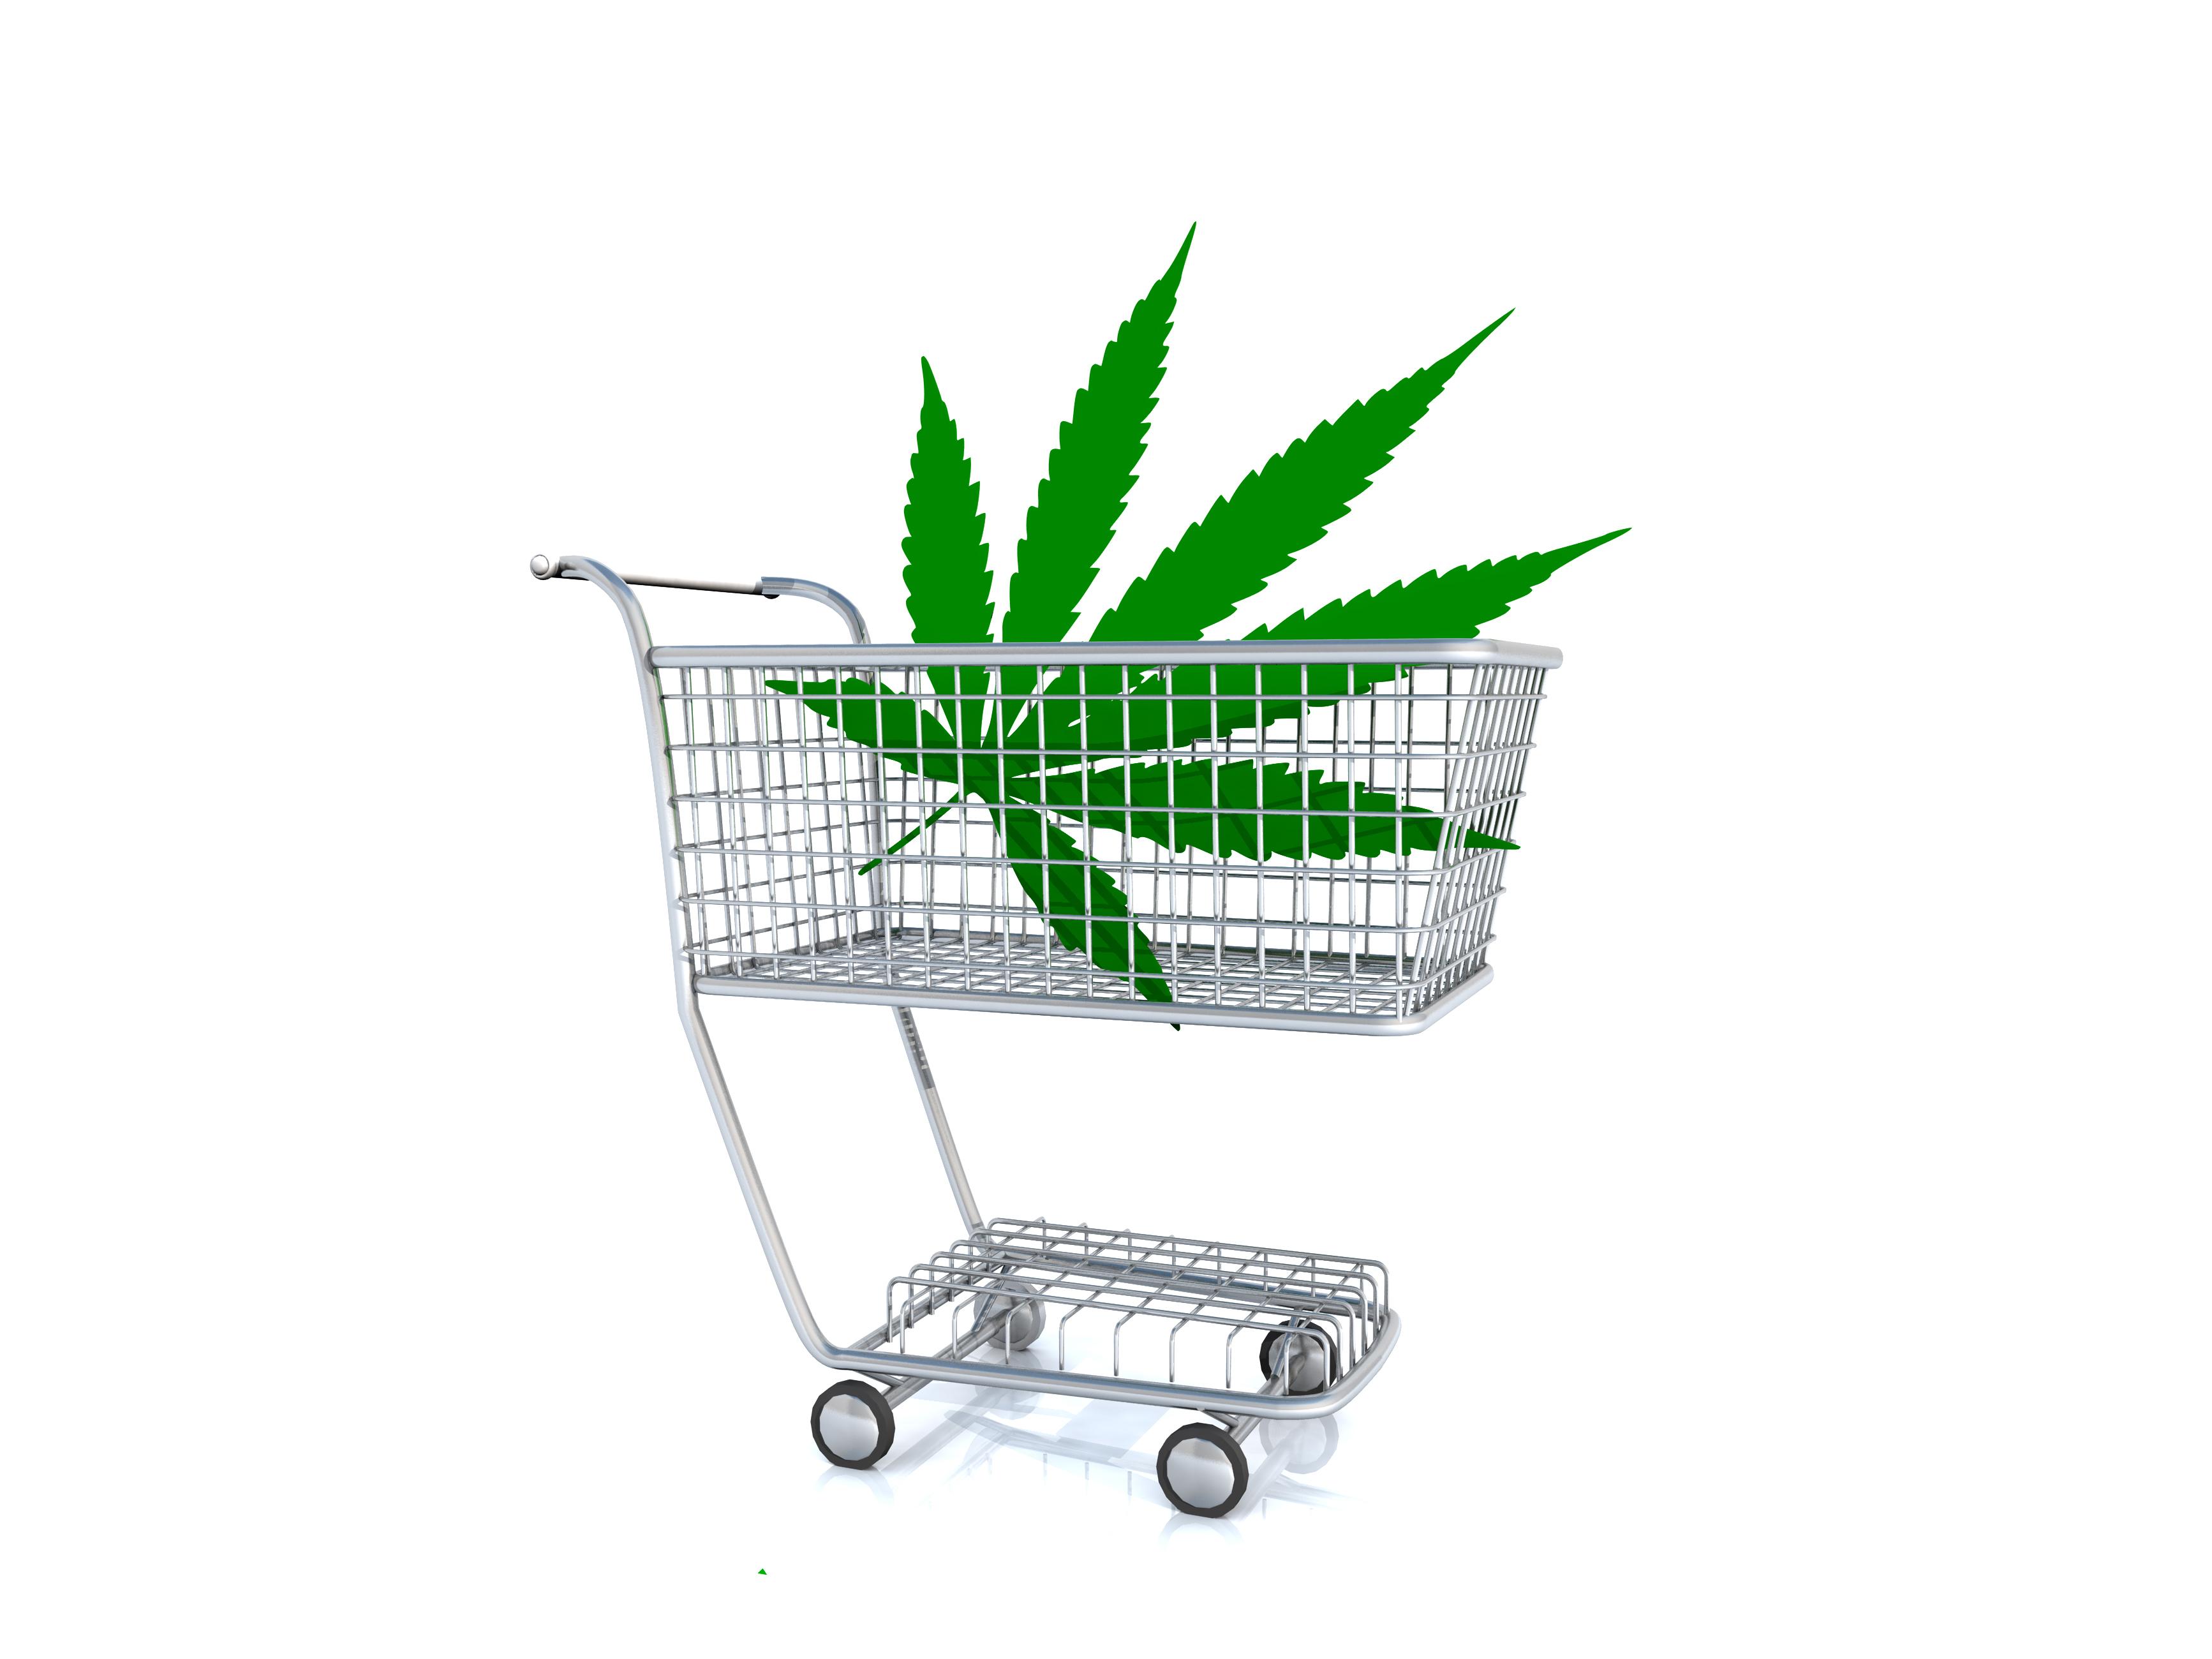 Marijuana leaf in a shopping cart.